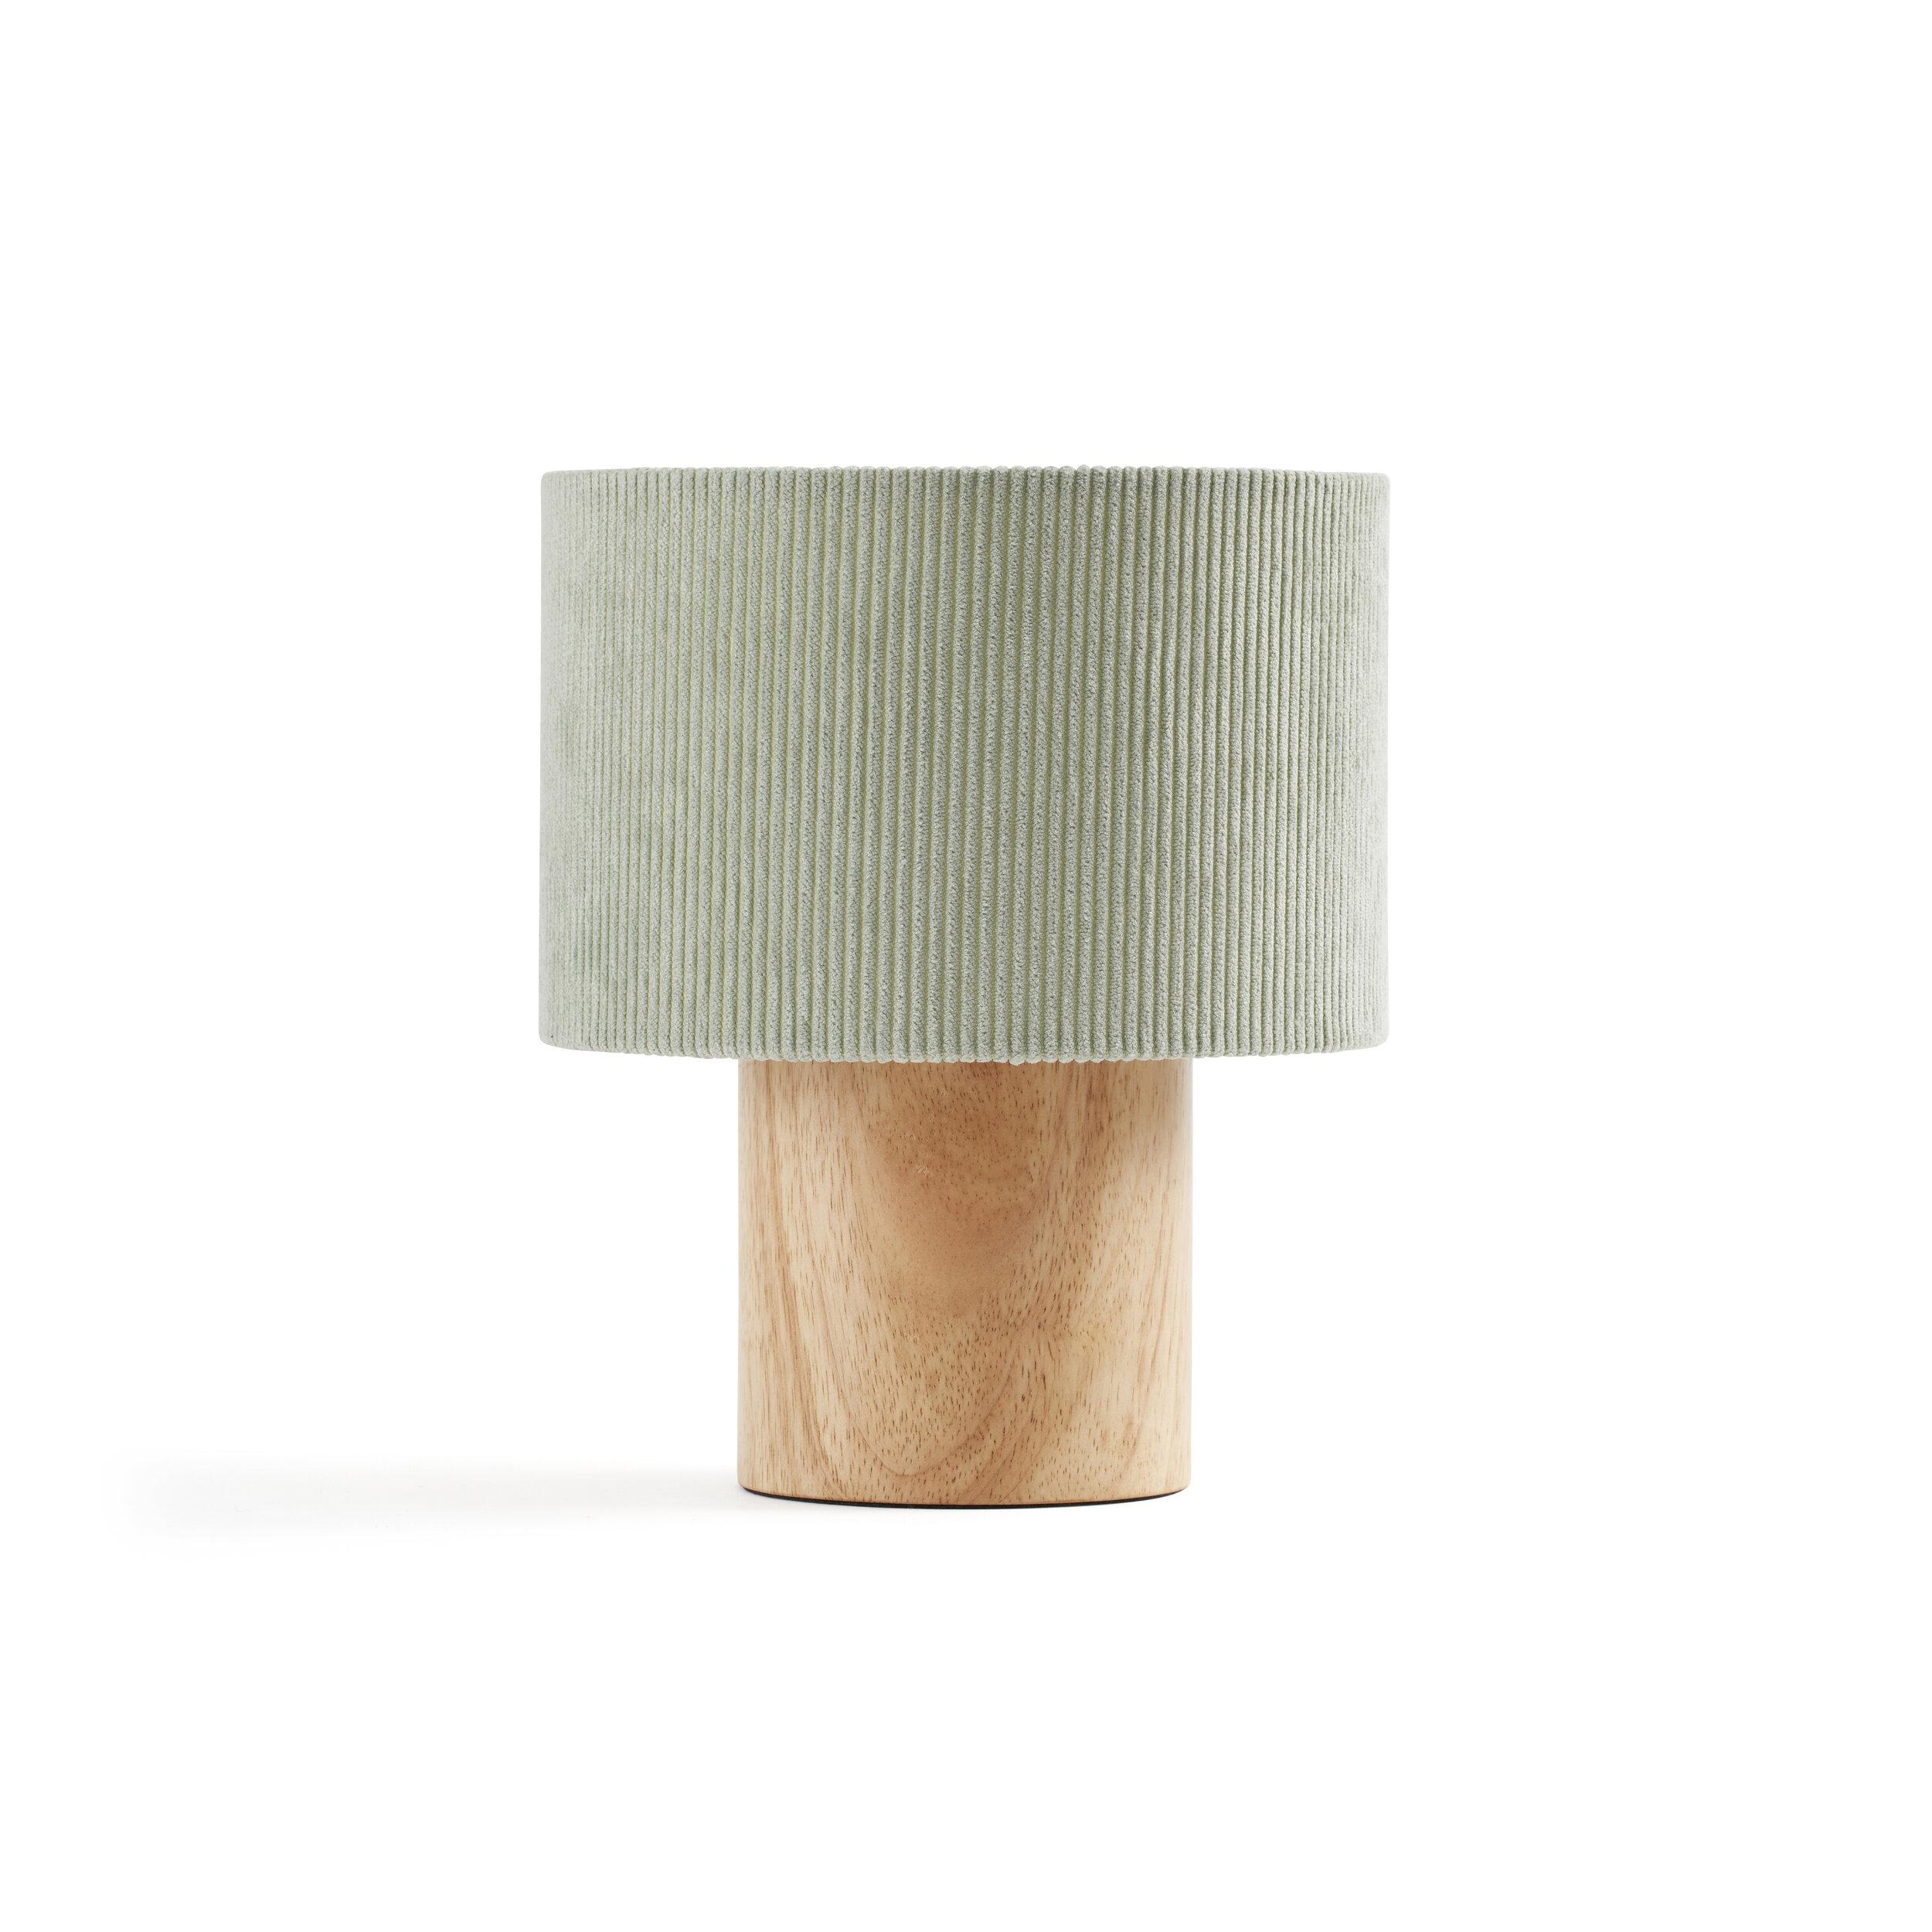 Cuckooland - Table Lamp Green Corduroy